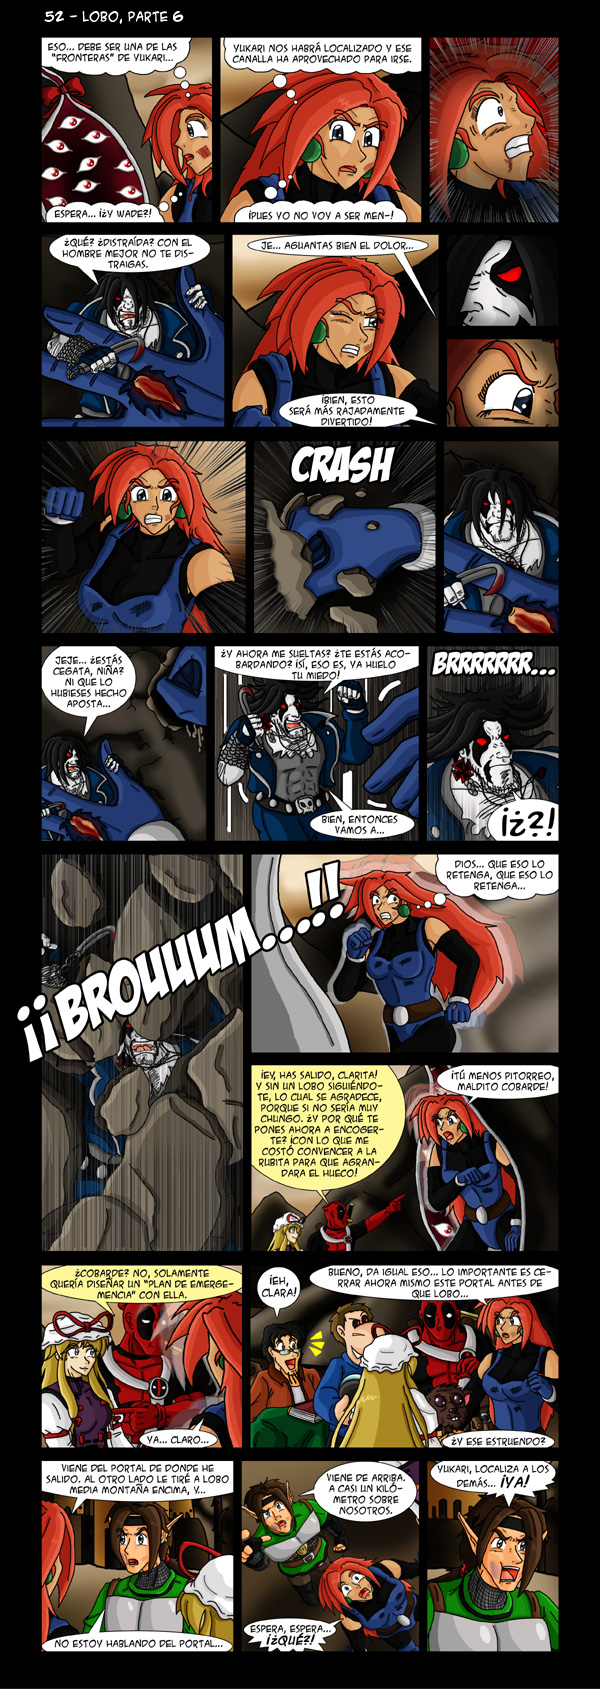 52 – Lobo, parte 6